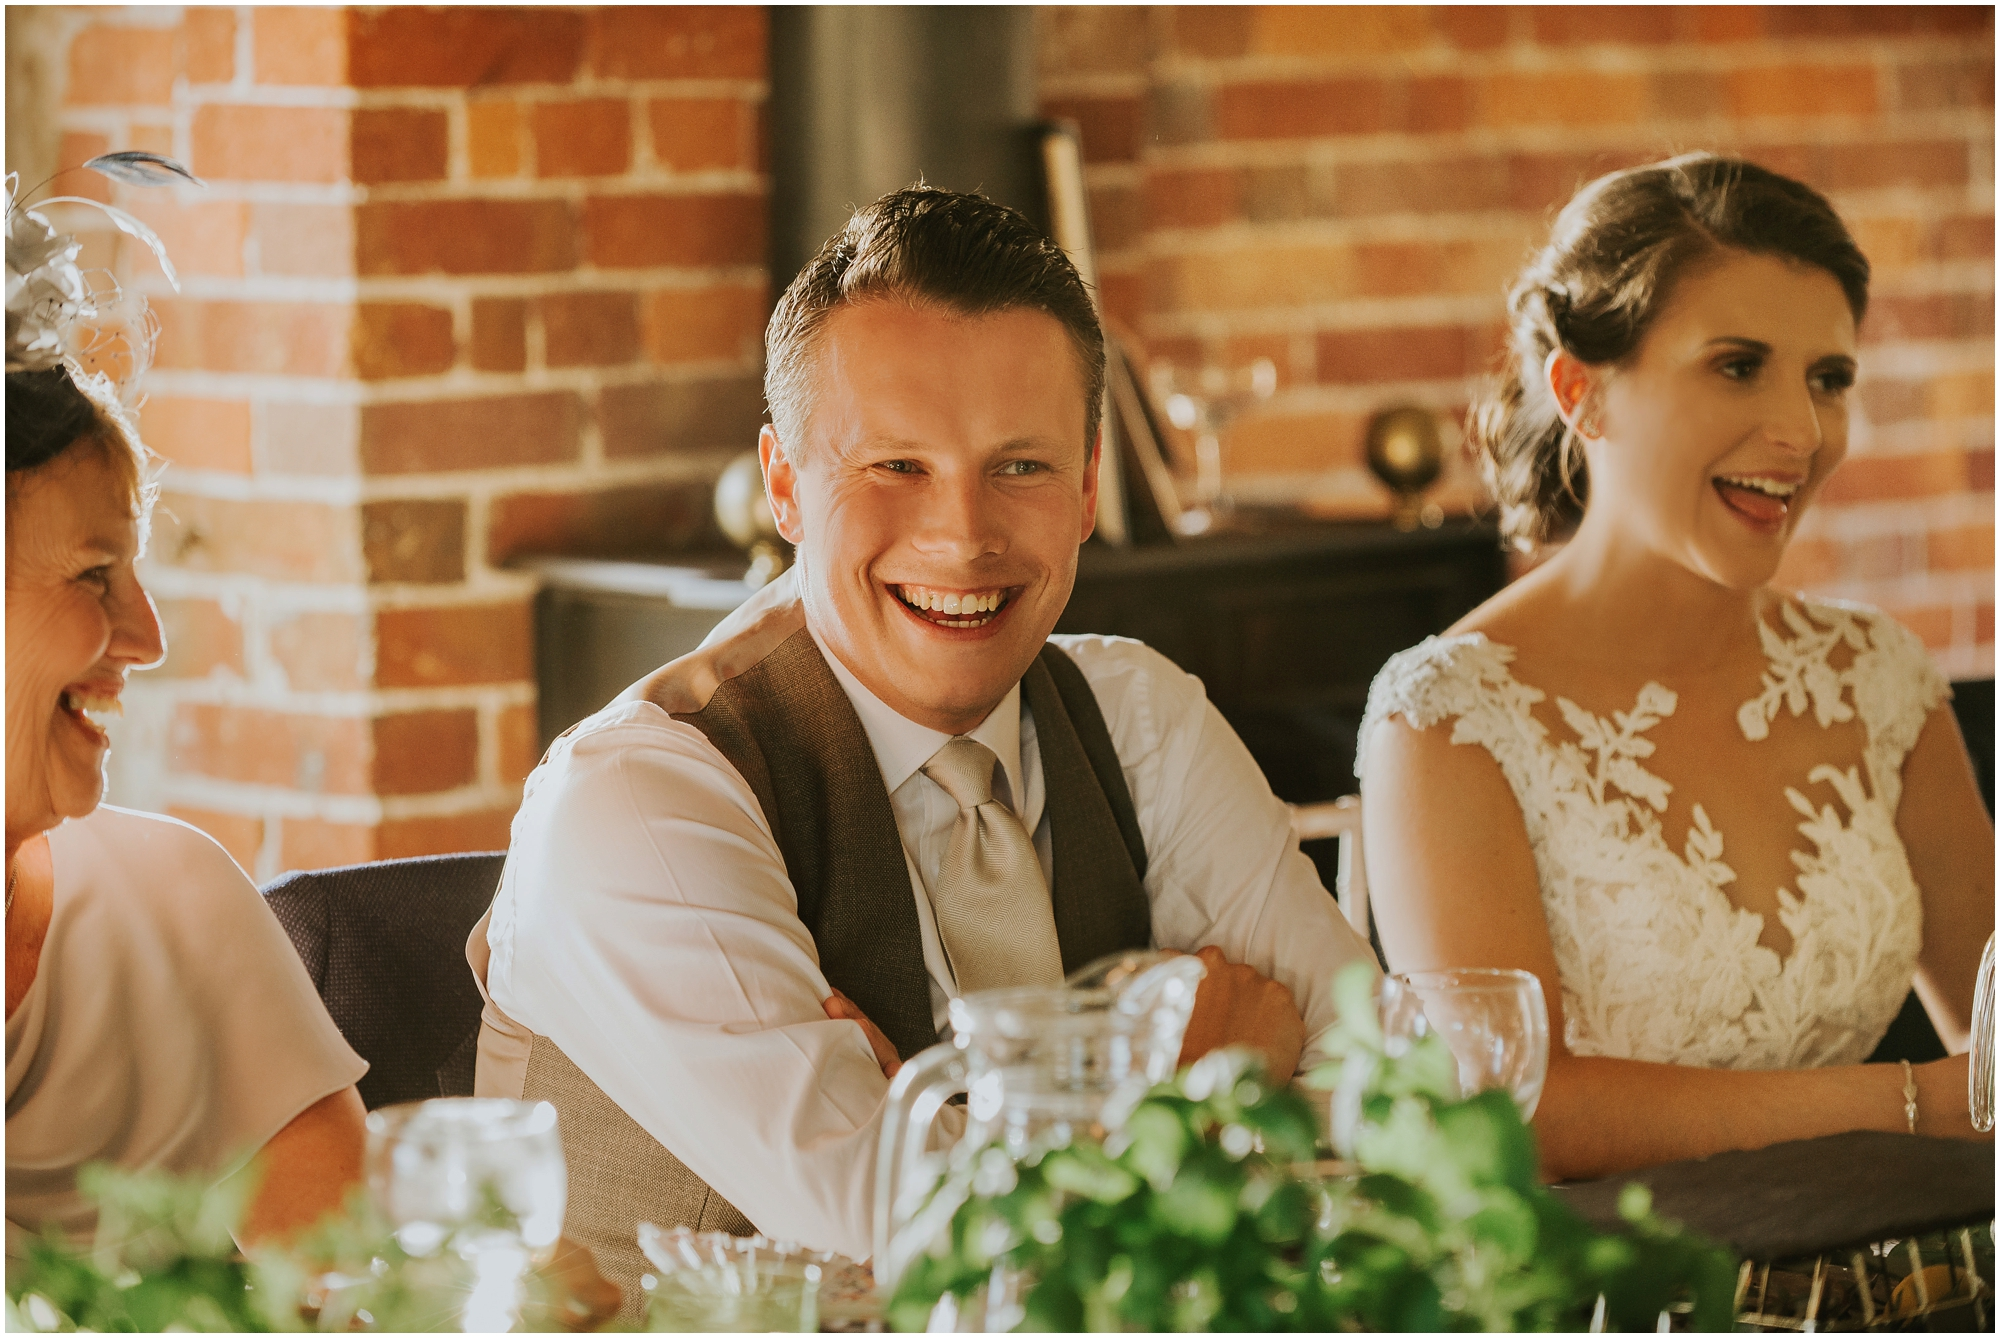 Sopley_Mill_Wedding_SamanthaDavisPhotography022.jpg